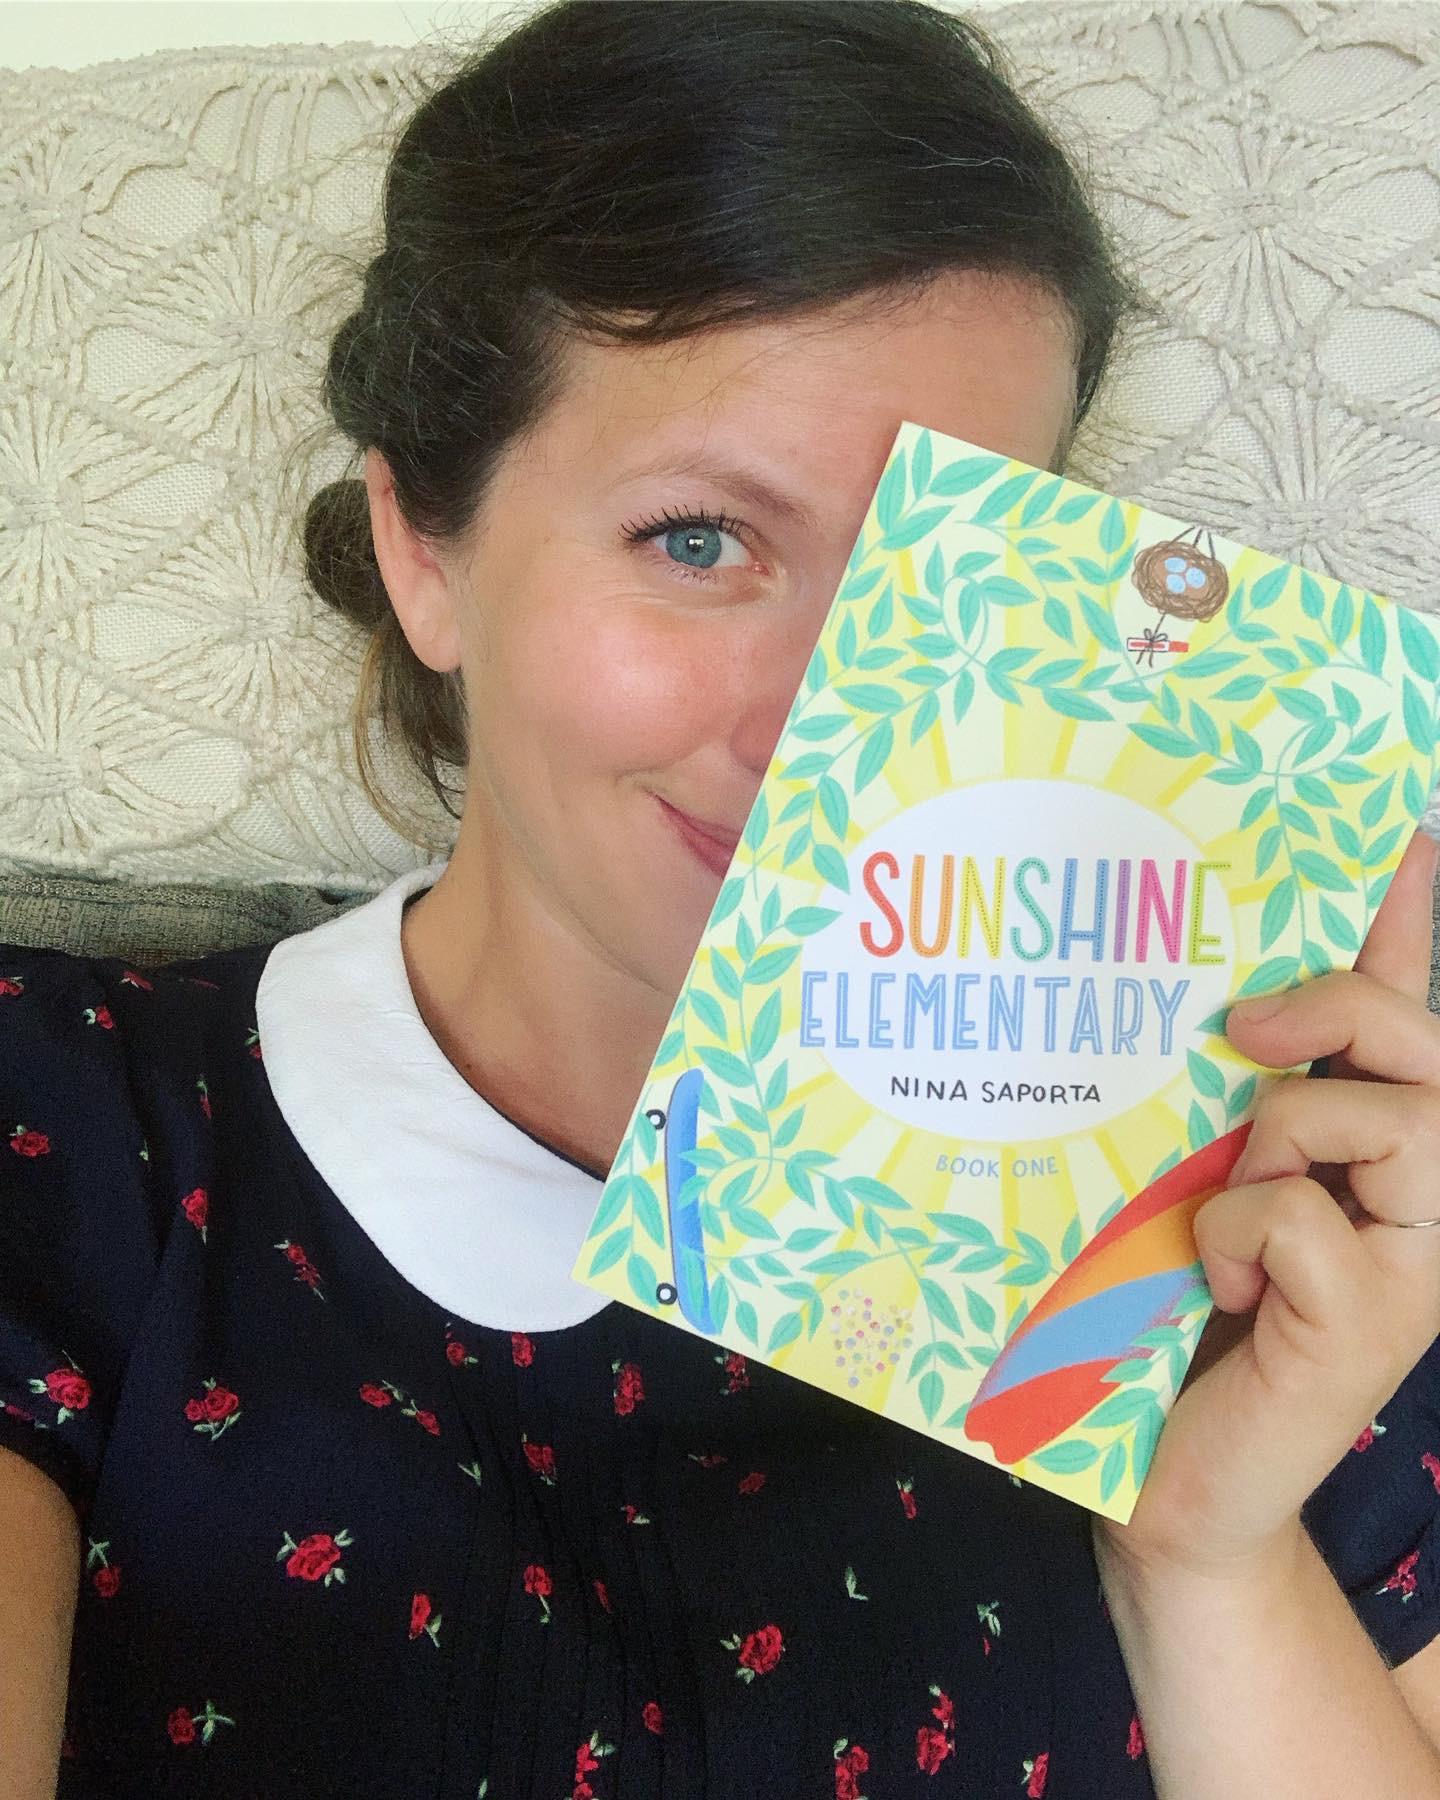 Author Nina Saporta holding an early copy of  Sunshine Elementary